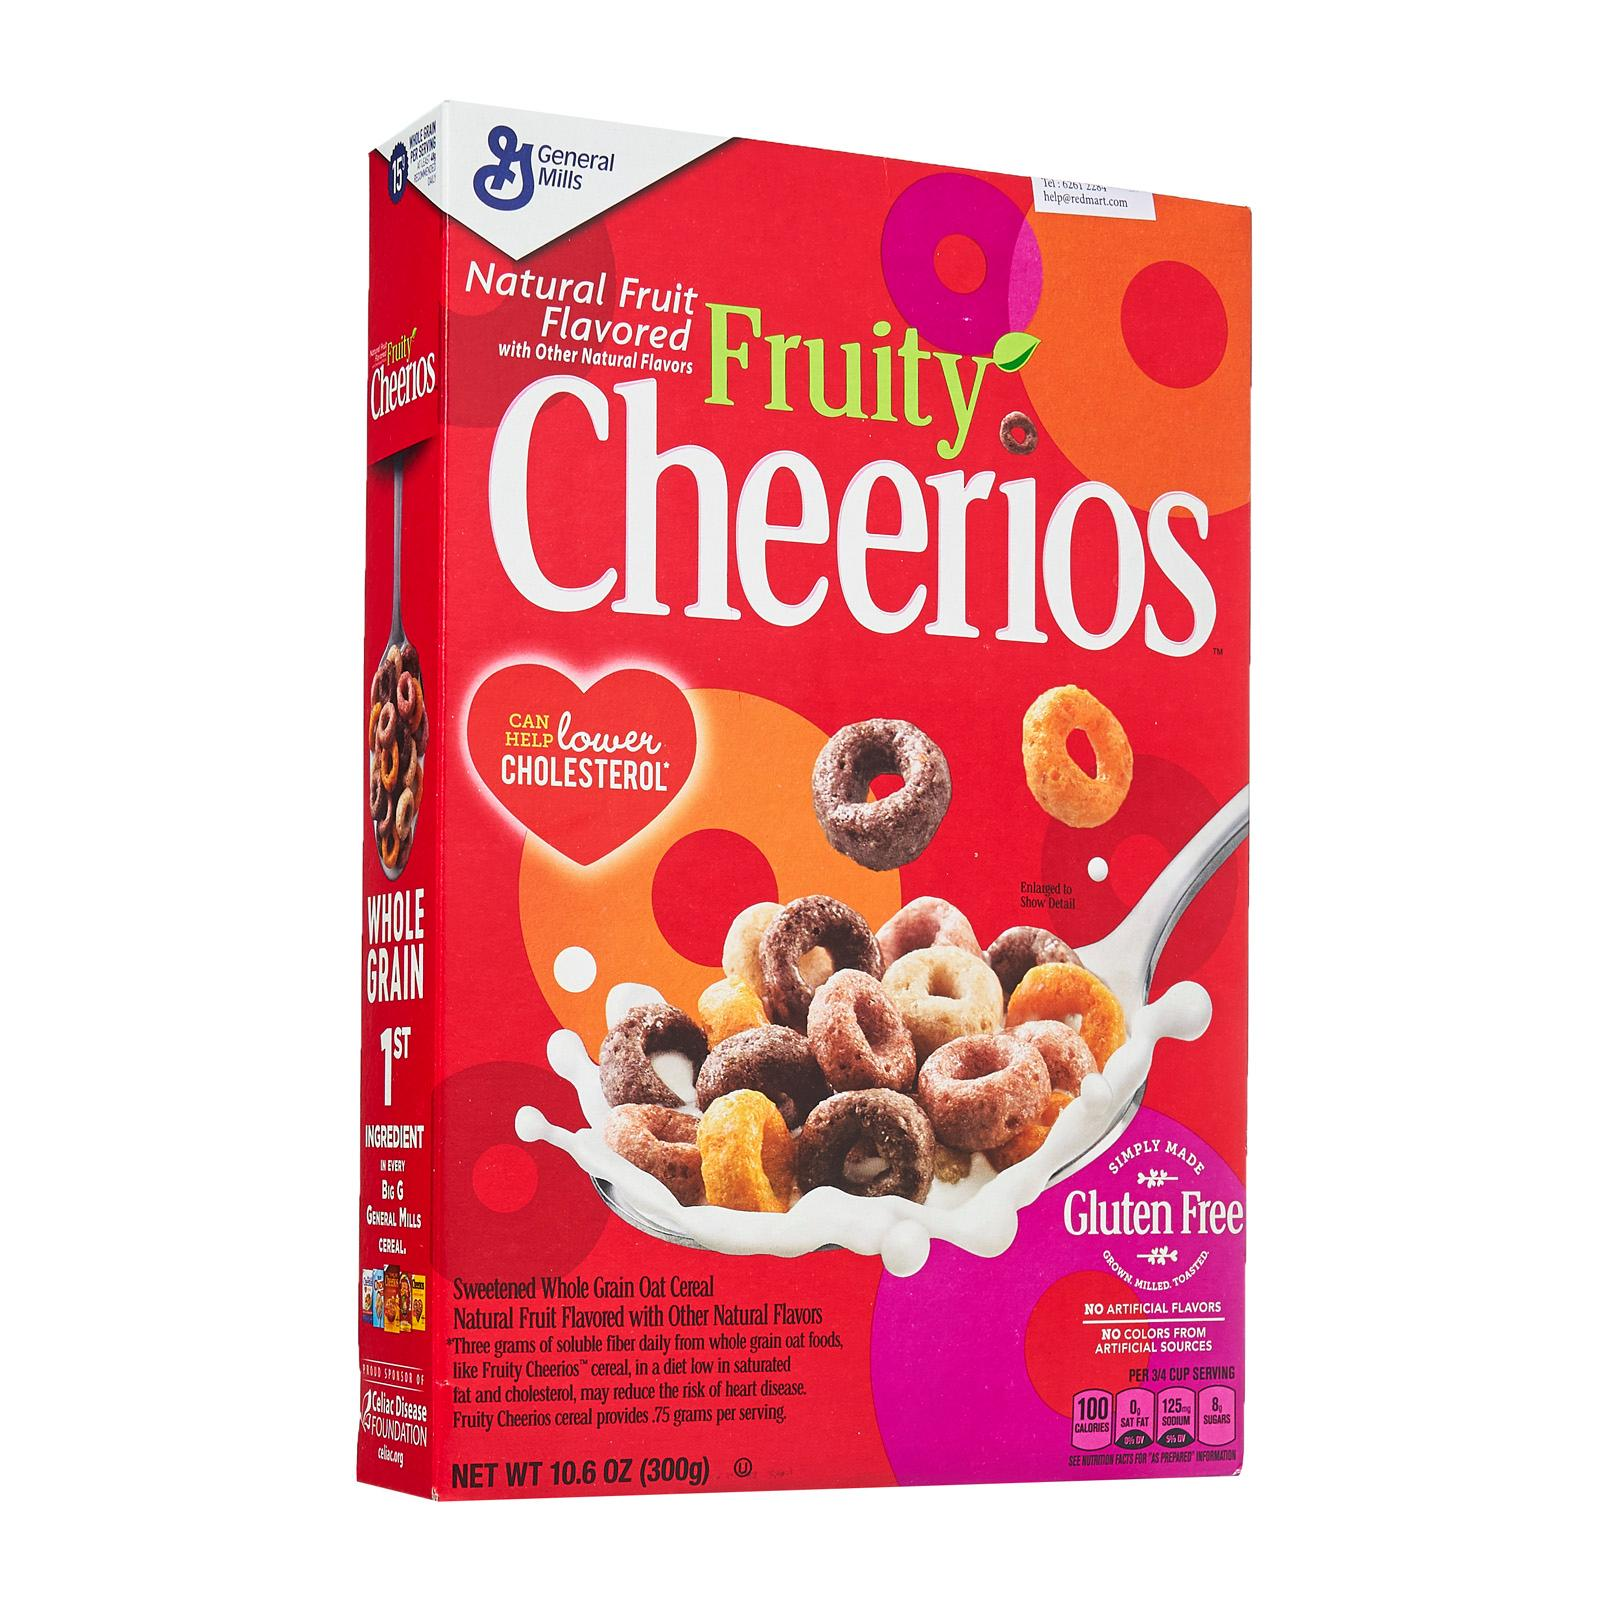 Gluten Free Fruity Cheerios Cereal